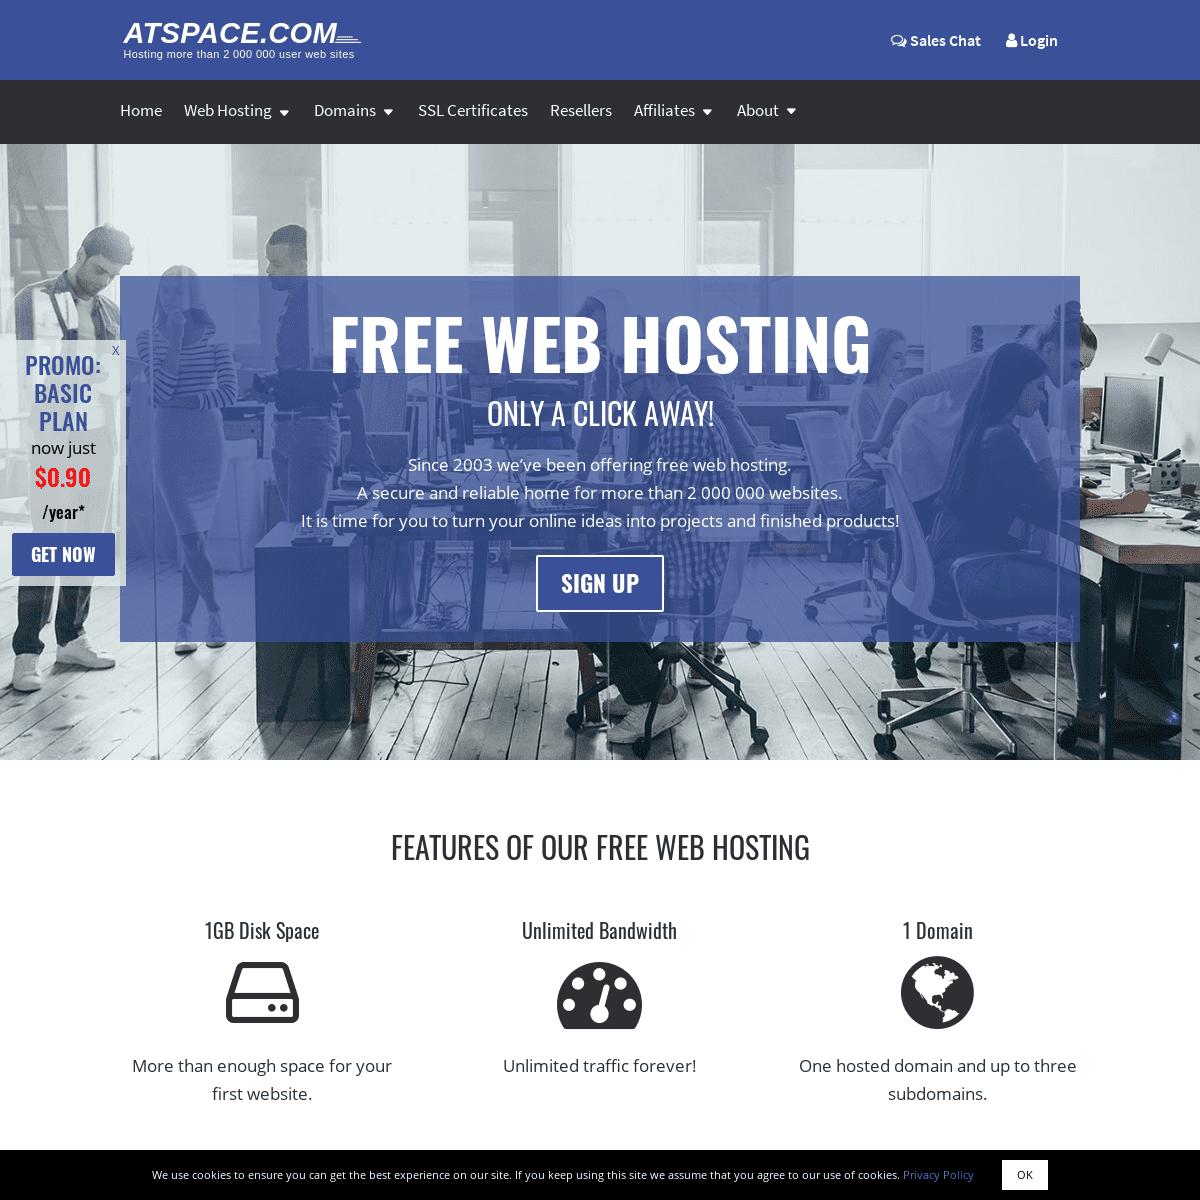 Free Web Hosting for Life, Free Domains, Easy Website Builder